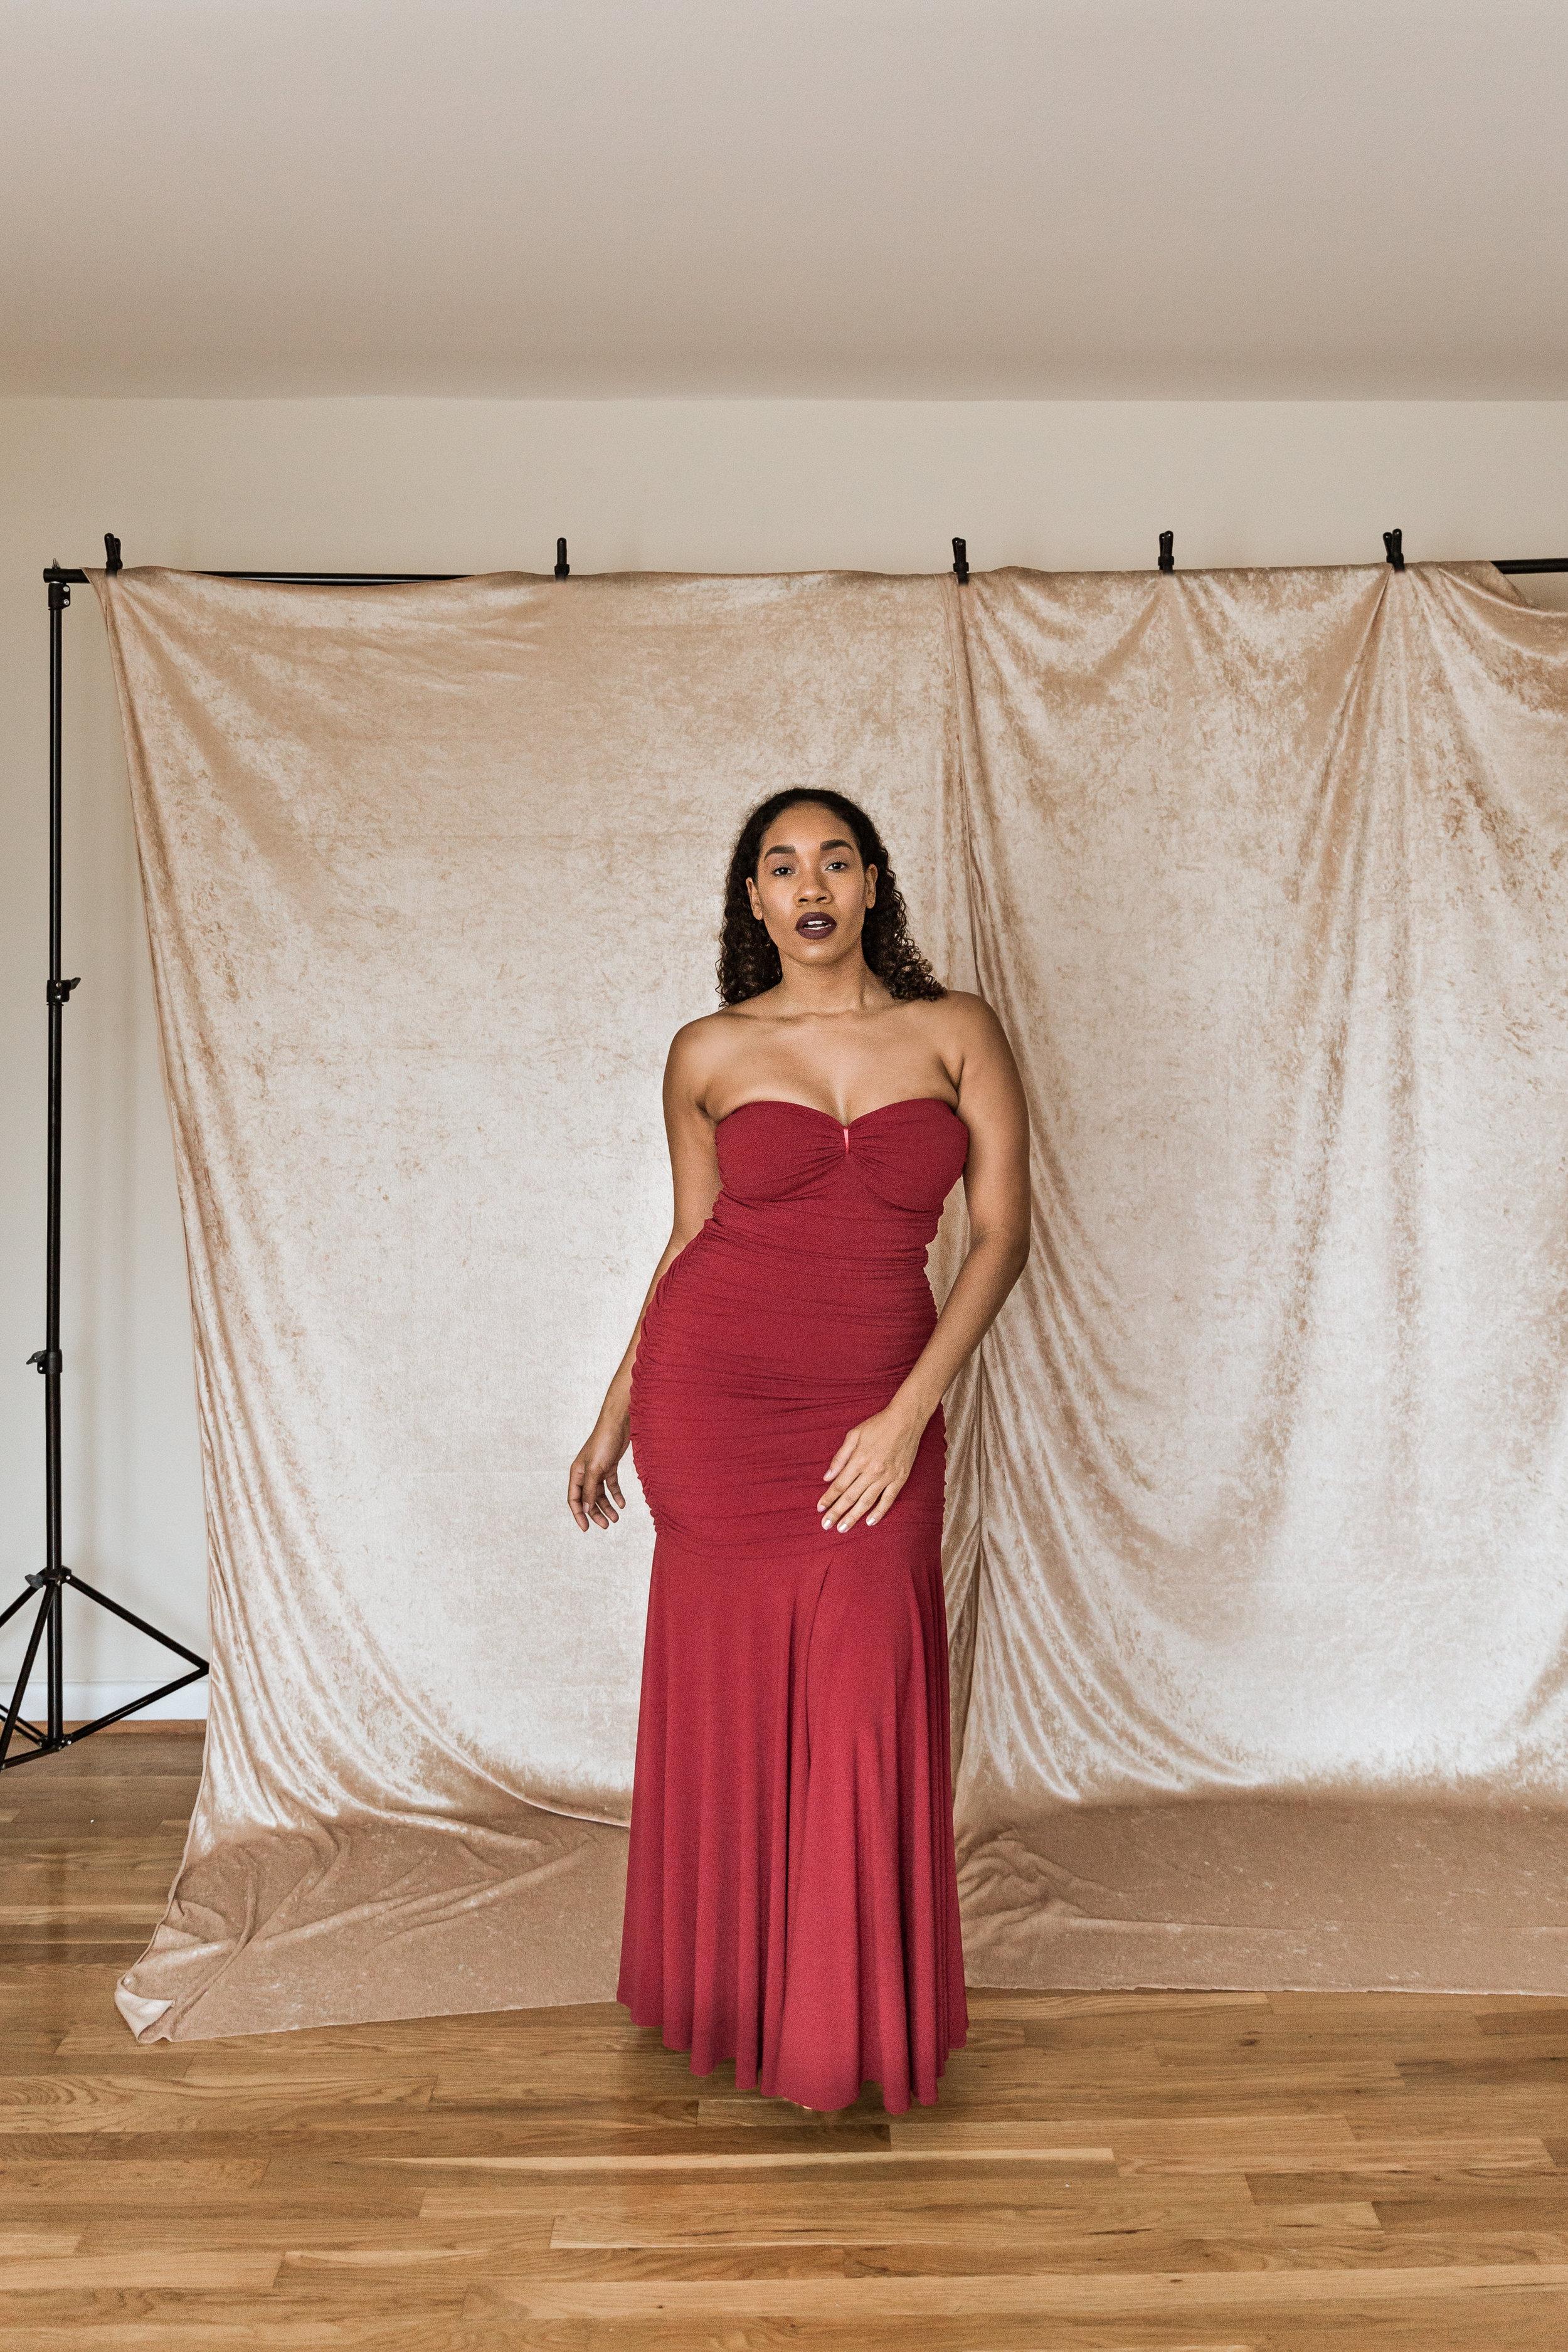 Tenneal McNair Photography Portraits Editorial Fashion Photographer Washington DC New Orleans NY (6).jpg